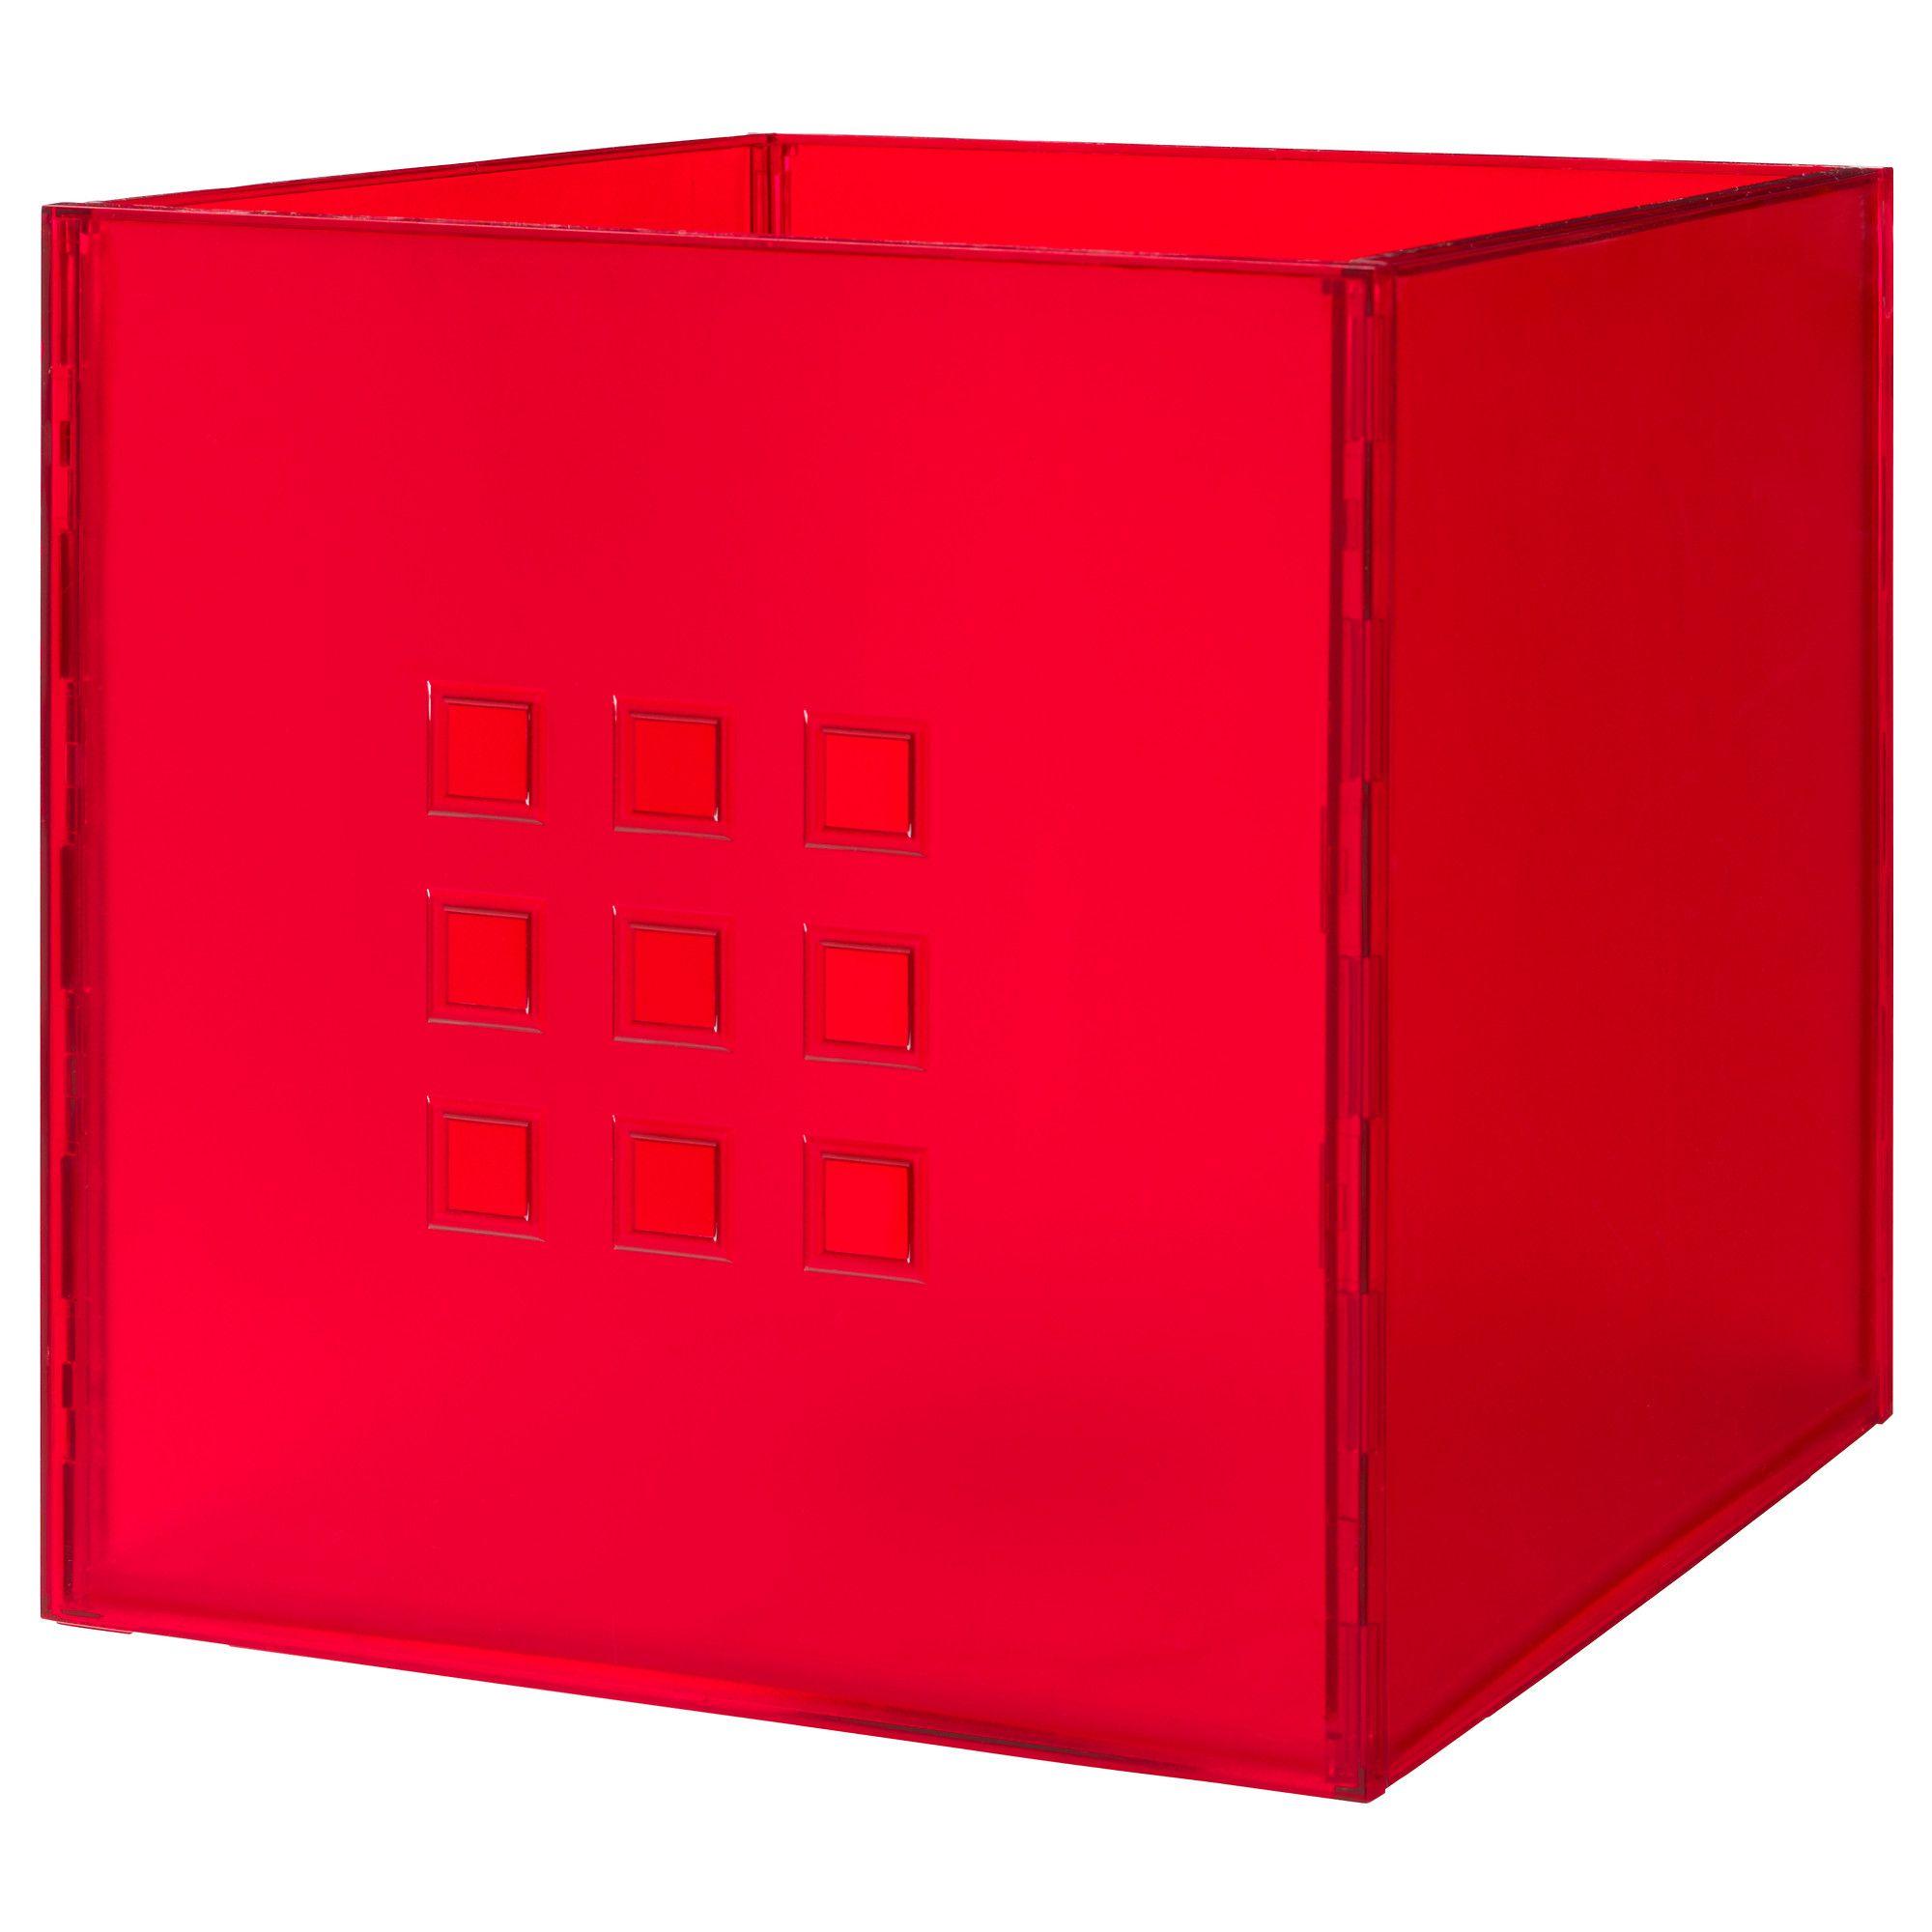 Favoloso LEKMAN Contenitore - rosso - IKEA | ♥ Organize ♥ | Pinterest VW34